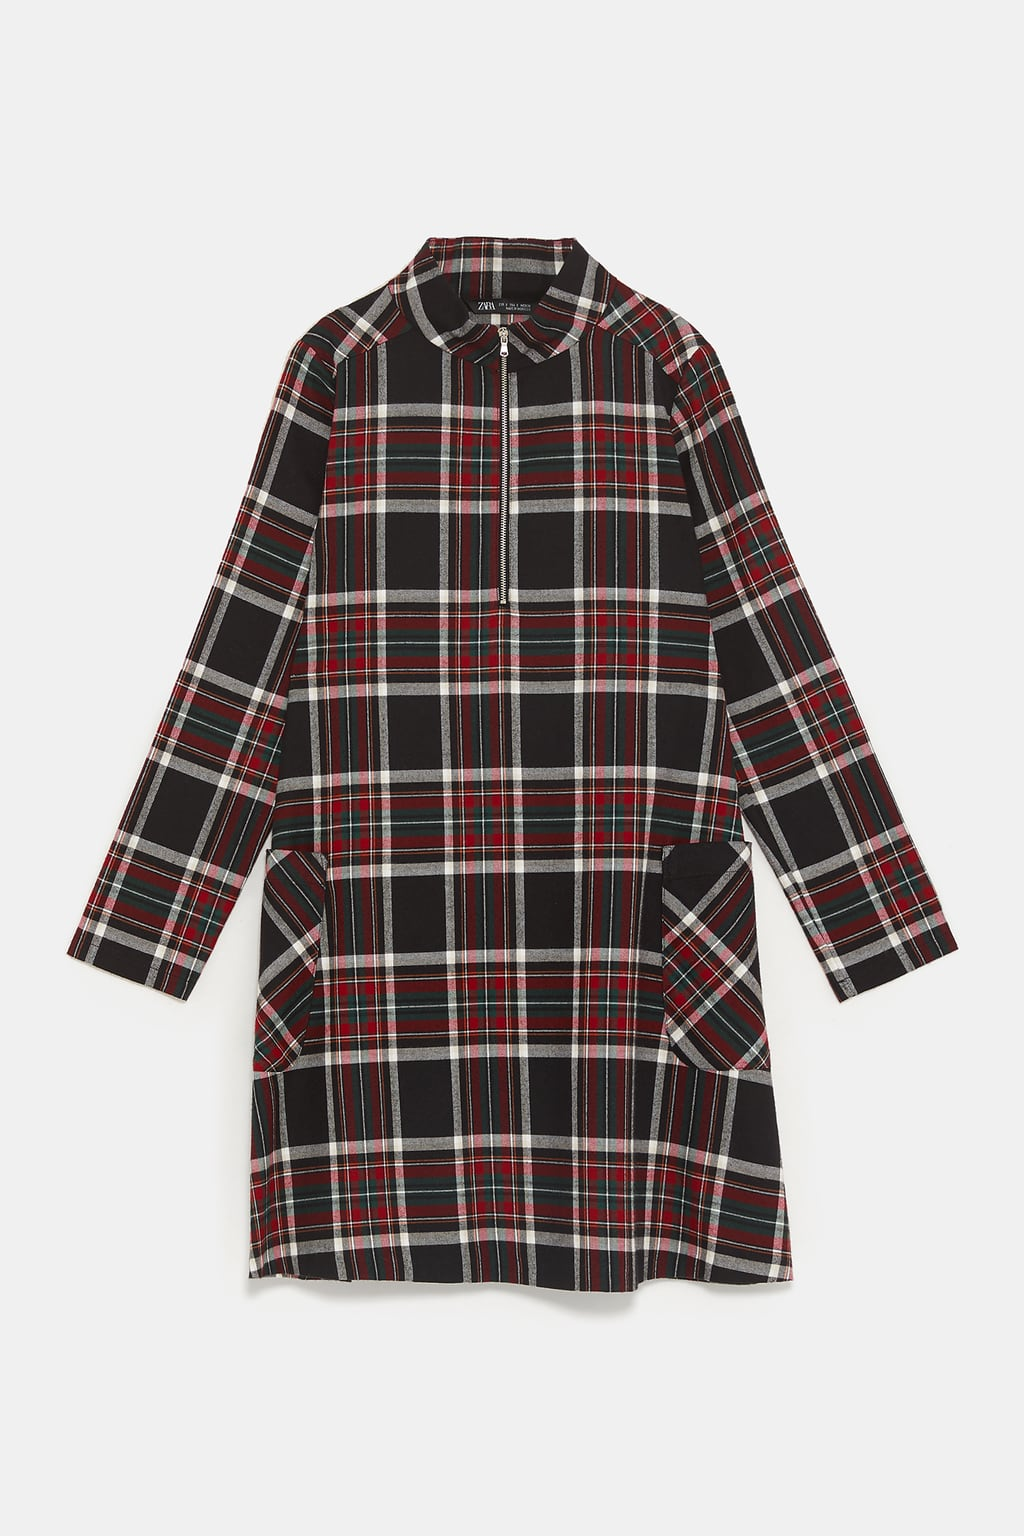 - PLAID DRESS49.90 CAD